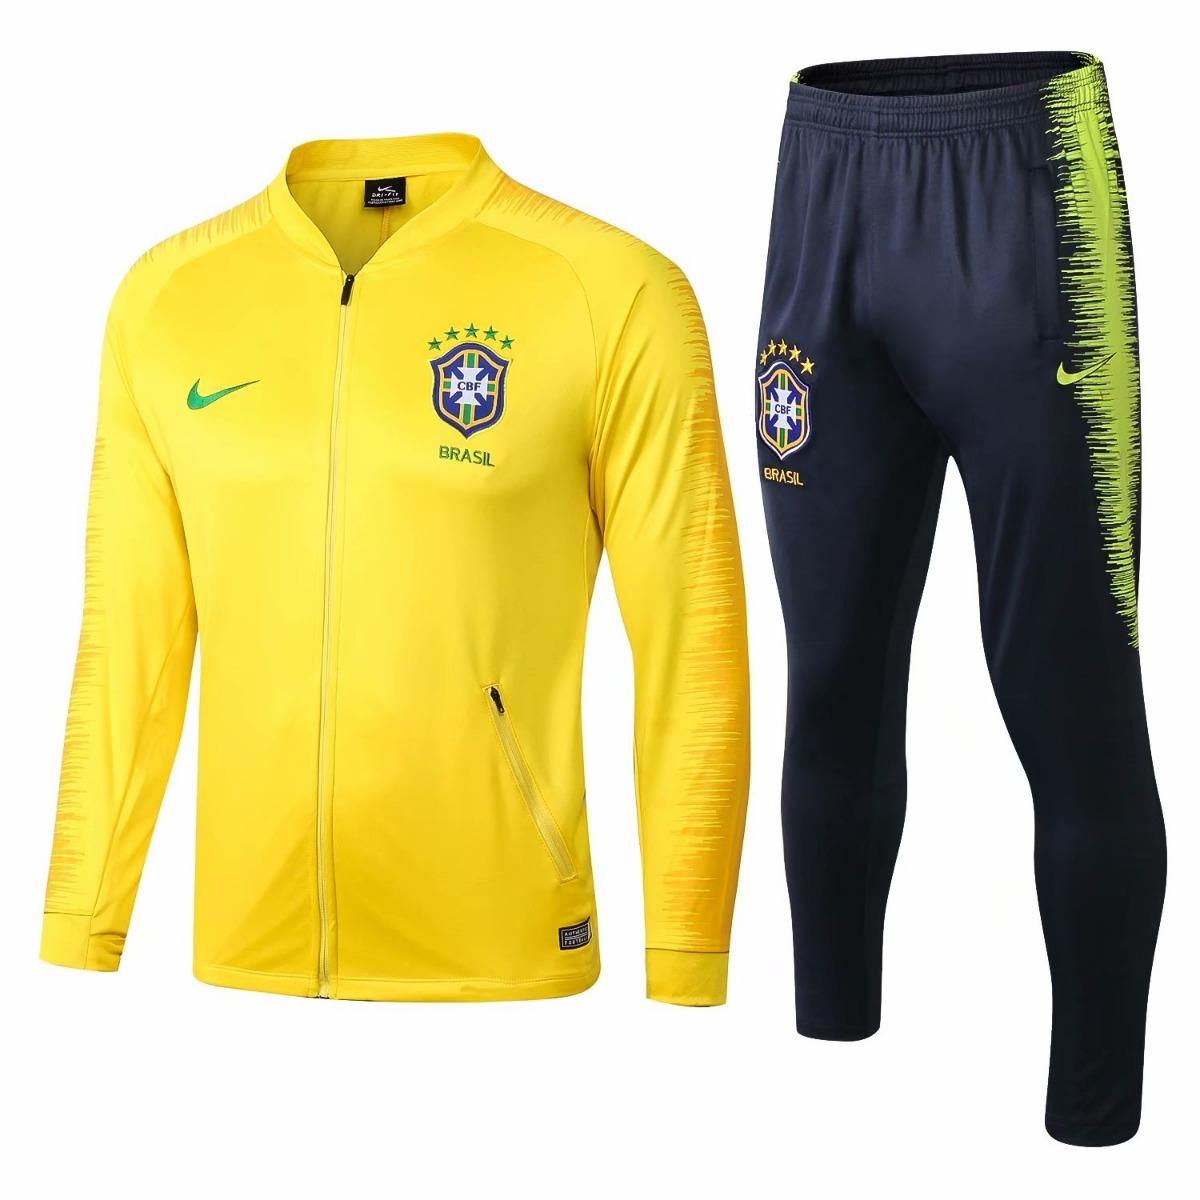 72b0f482ae kit nike brasil jaqueta + calça 2018 19. Carregando zoom.